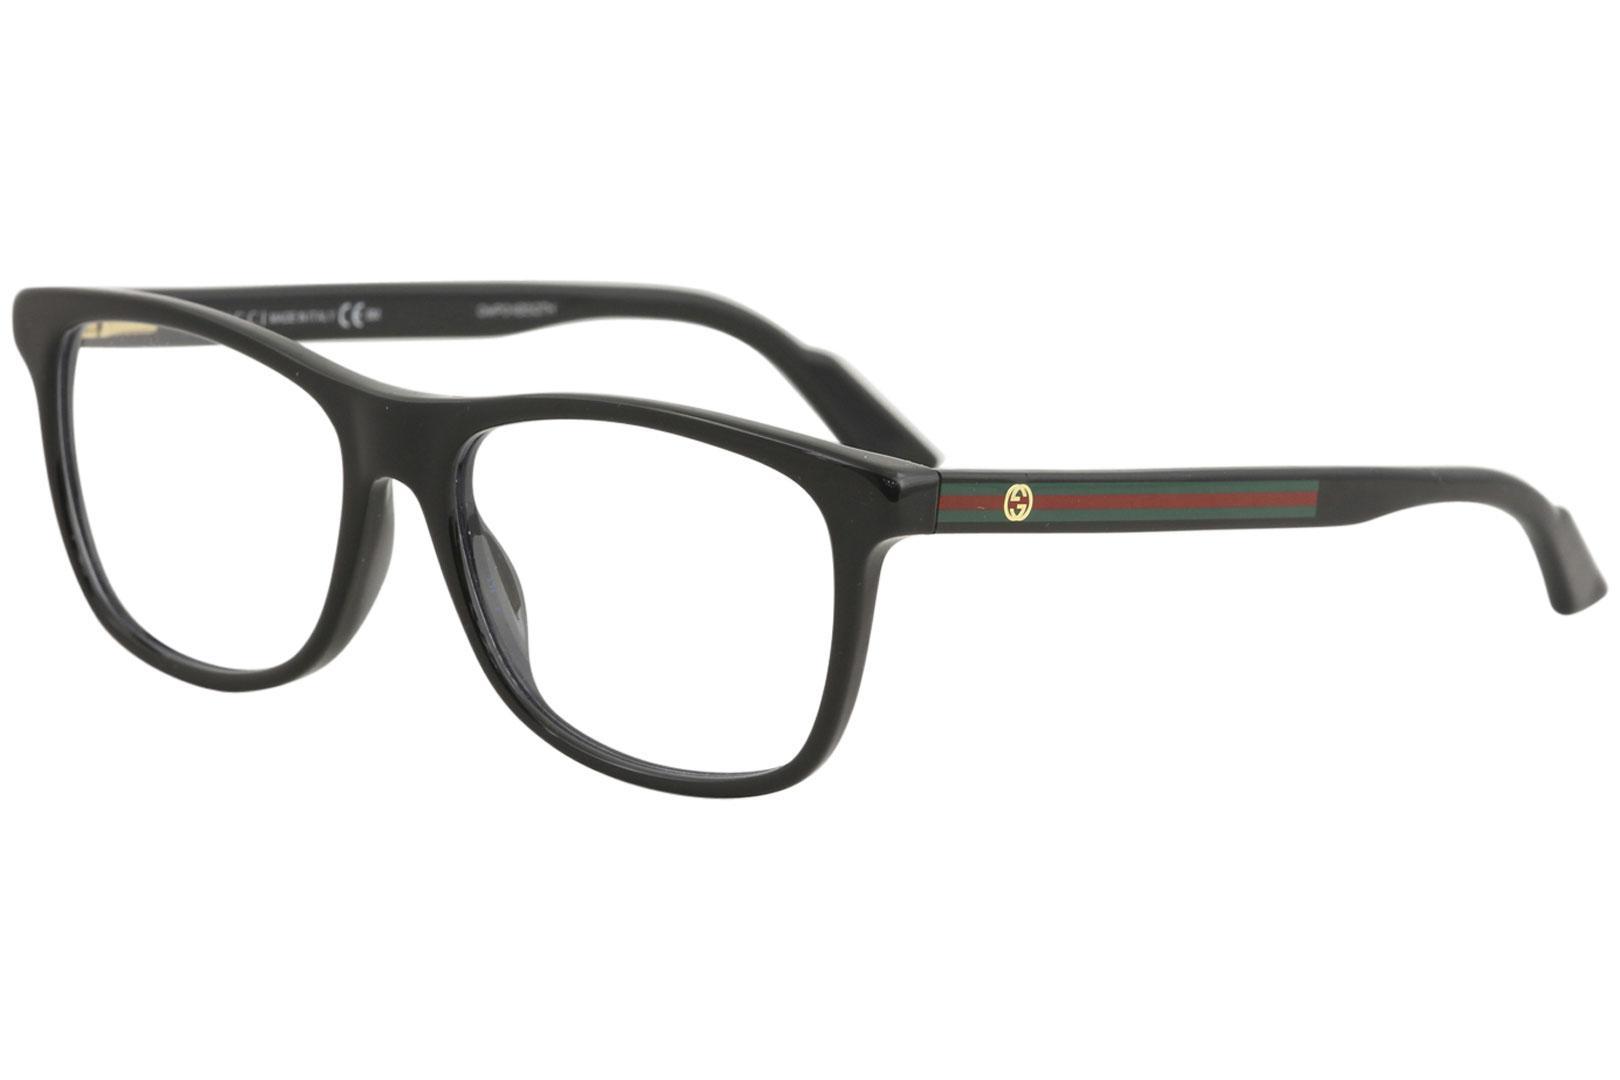 0eb6e561ad2 Gucci Men s Eyeglasses GG3725 GG 3725 Full Rim Optical Frame by Gucci